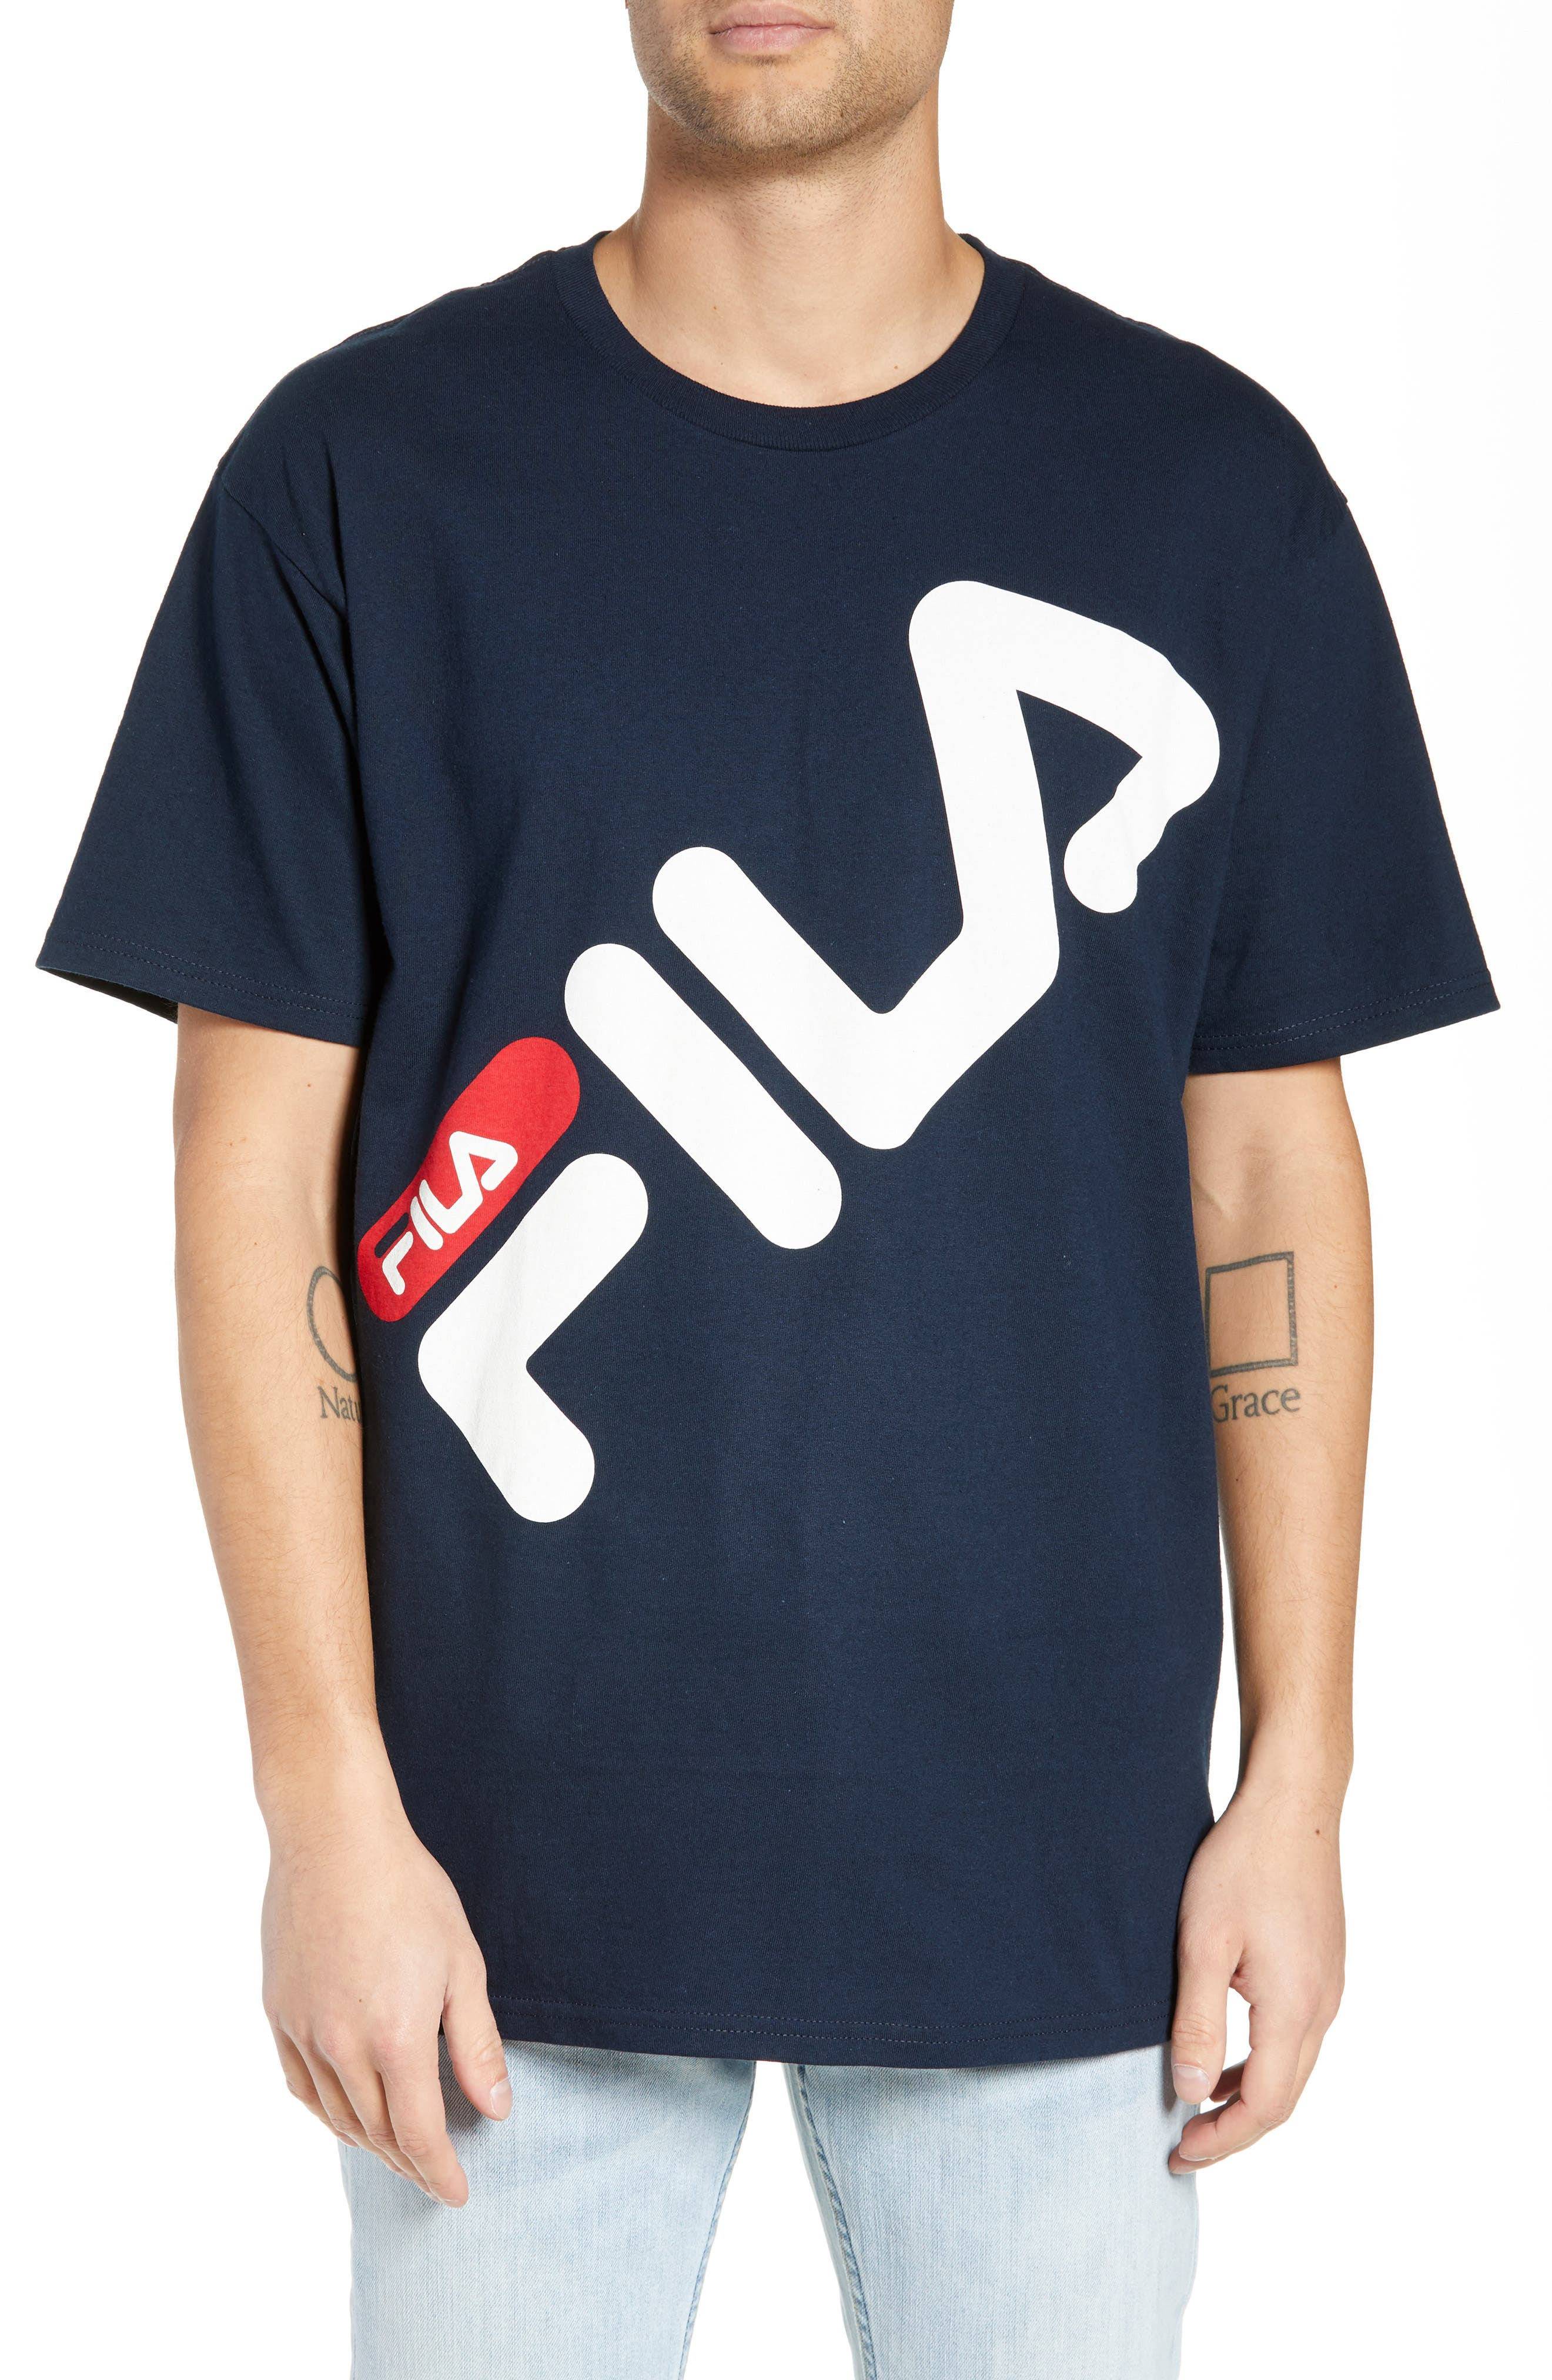 Micah Logo T-Shirt,                             Main thumbnail 1, color,                             NAVY/ WHITE/ CHINESE RED